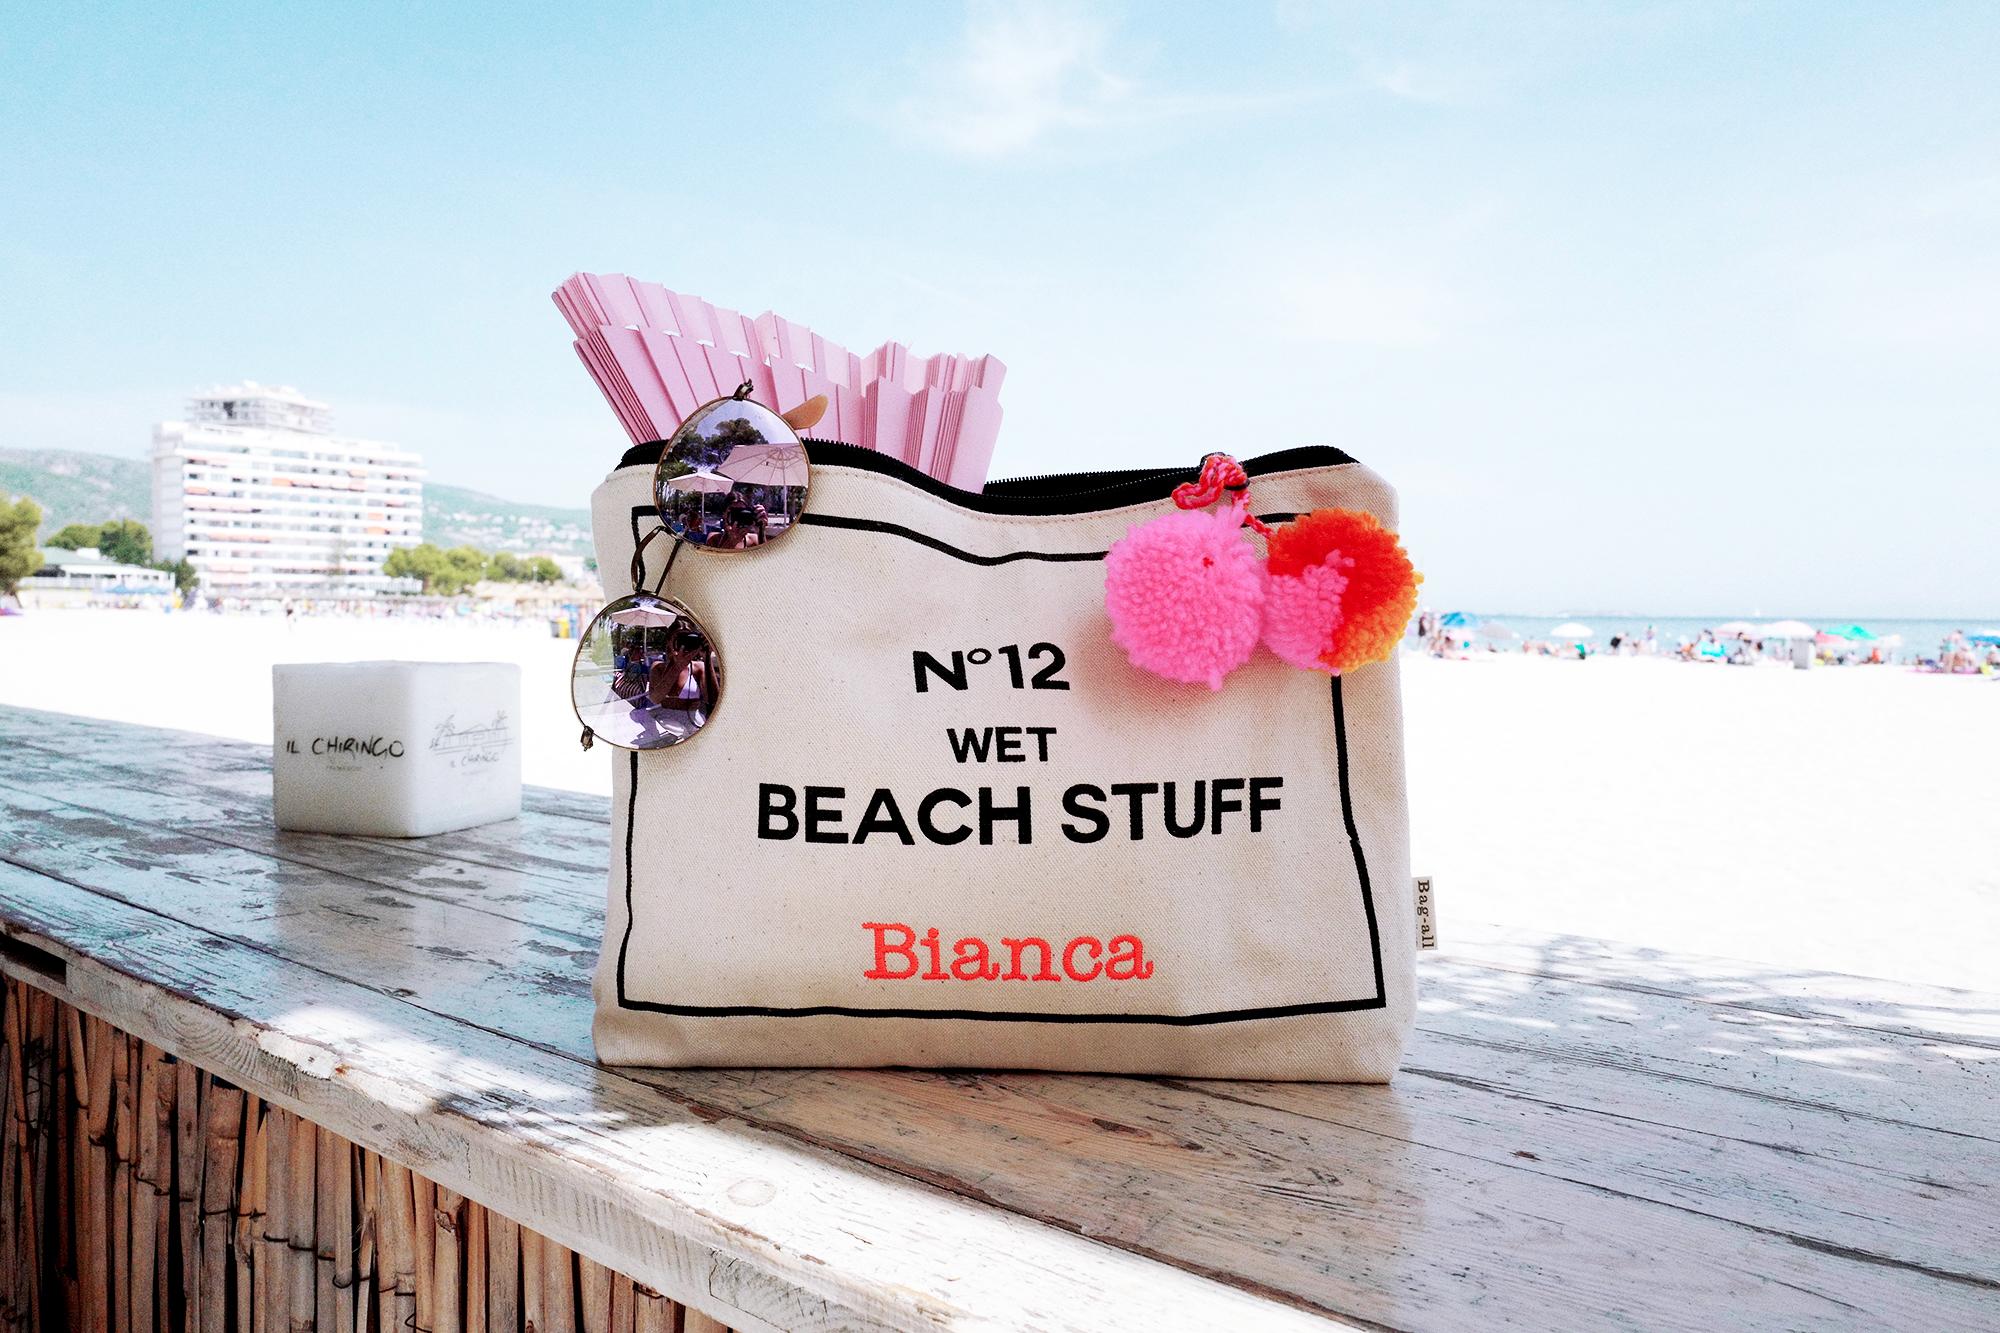 beachbag bagall bianca palma blogg